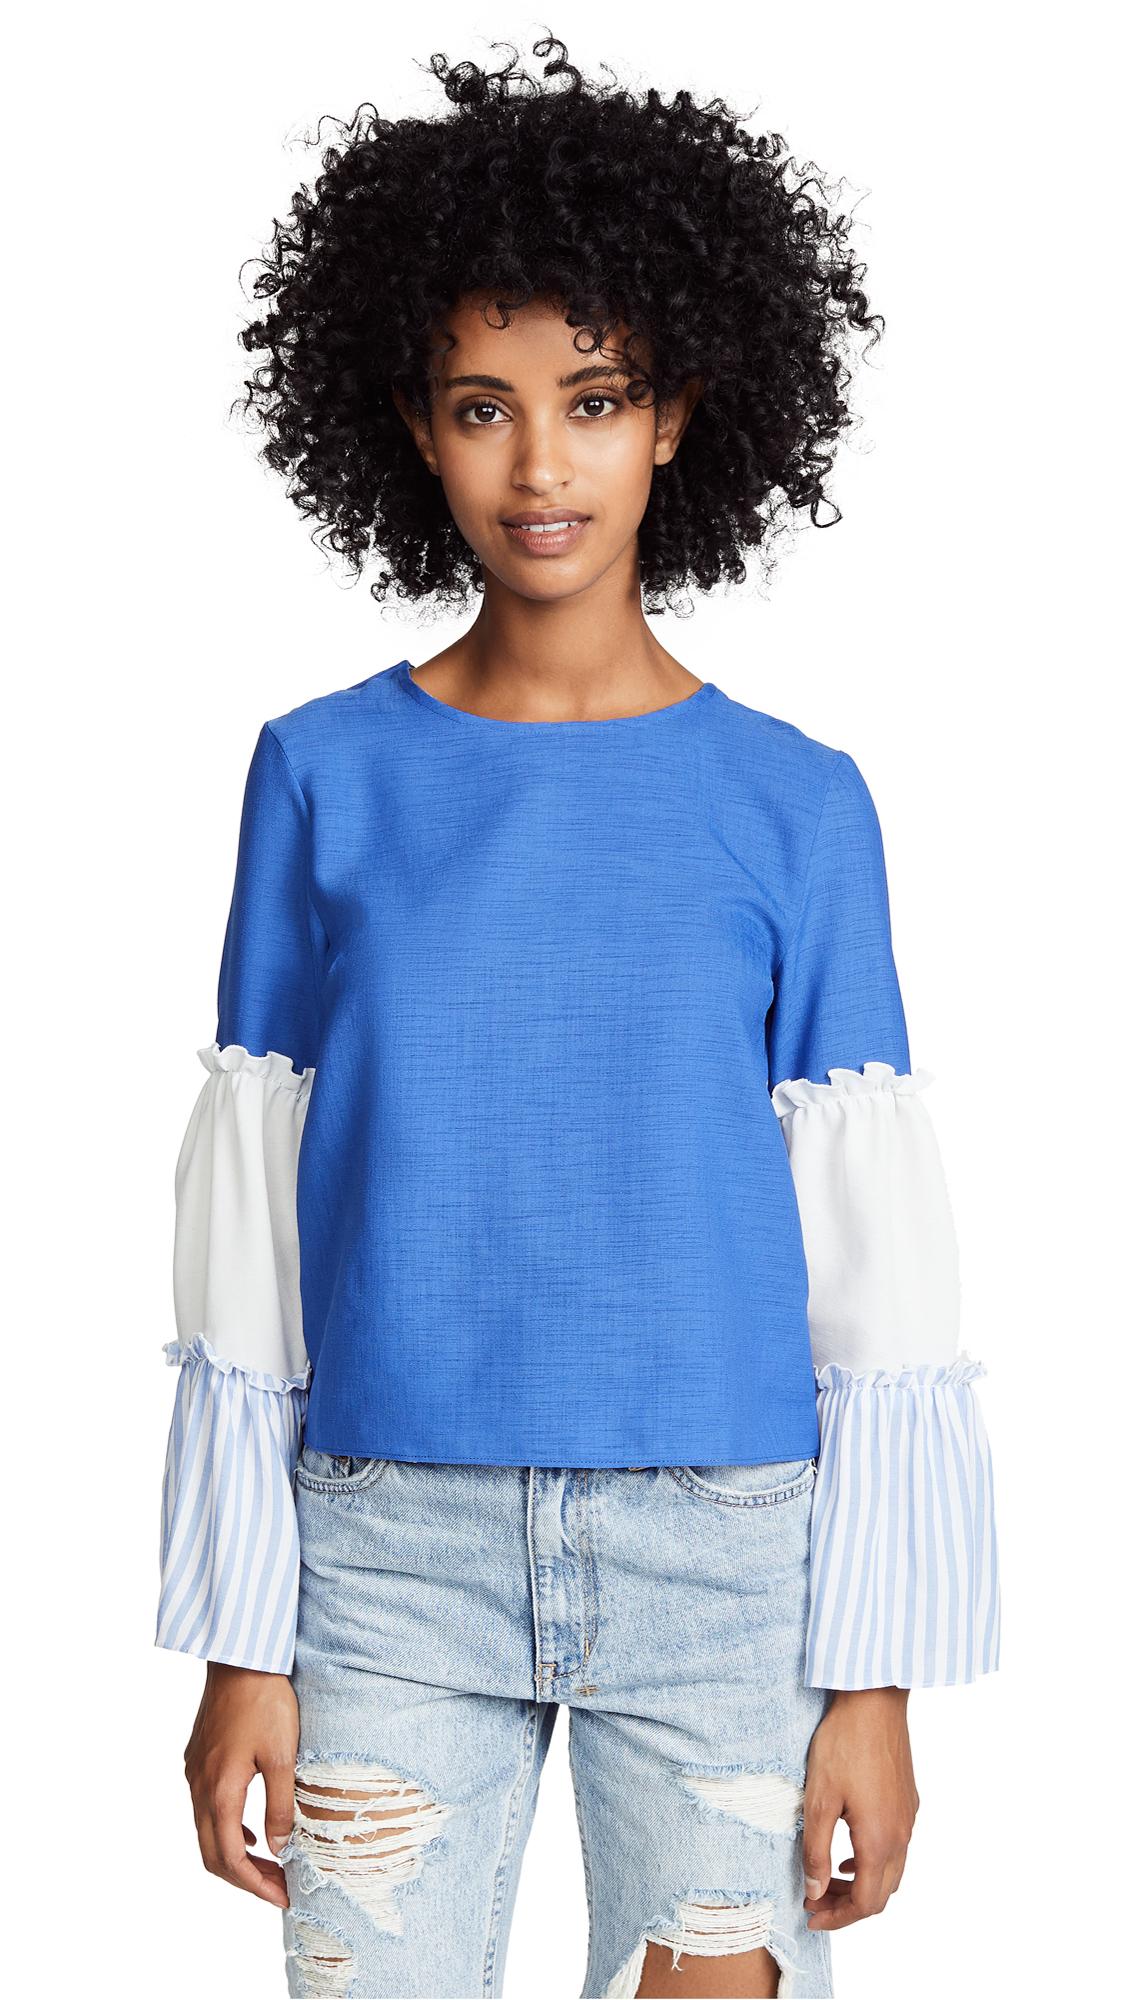 ENGLISH FACTORY Long Sleeve Ruffled Top - Marina Blue